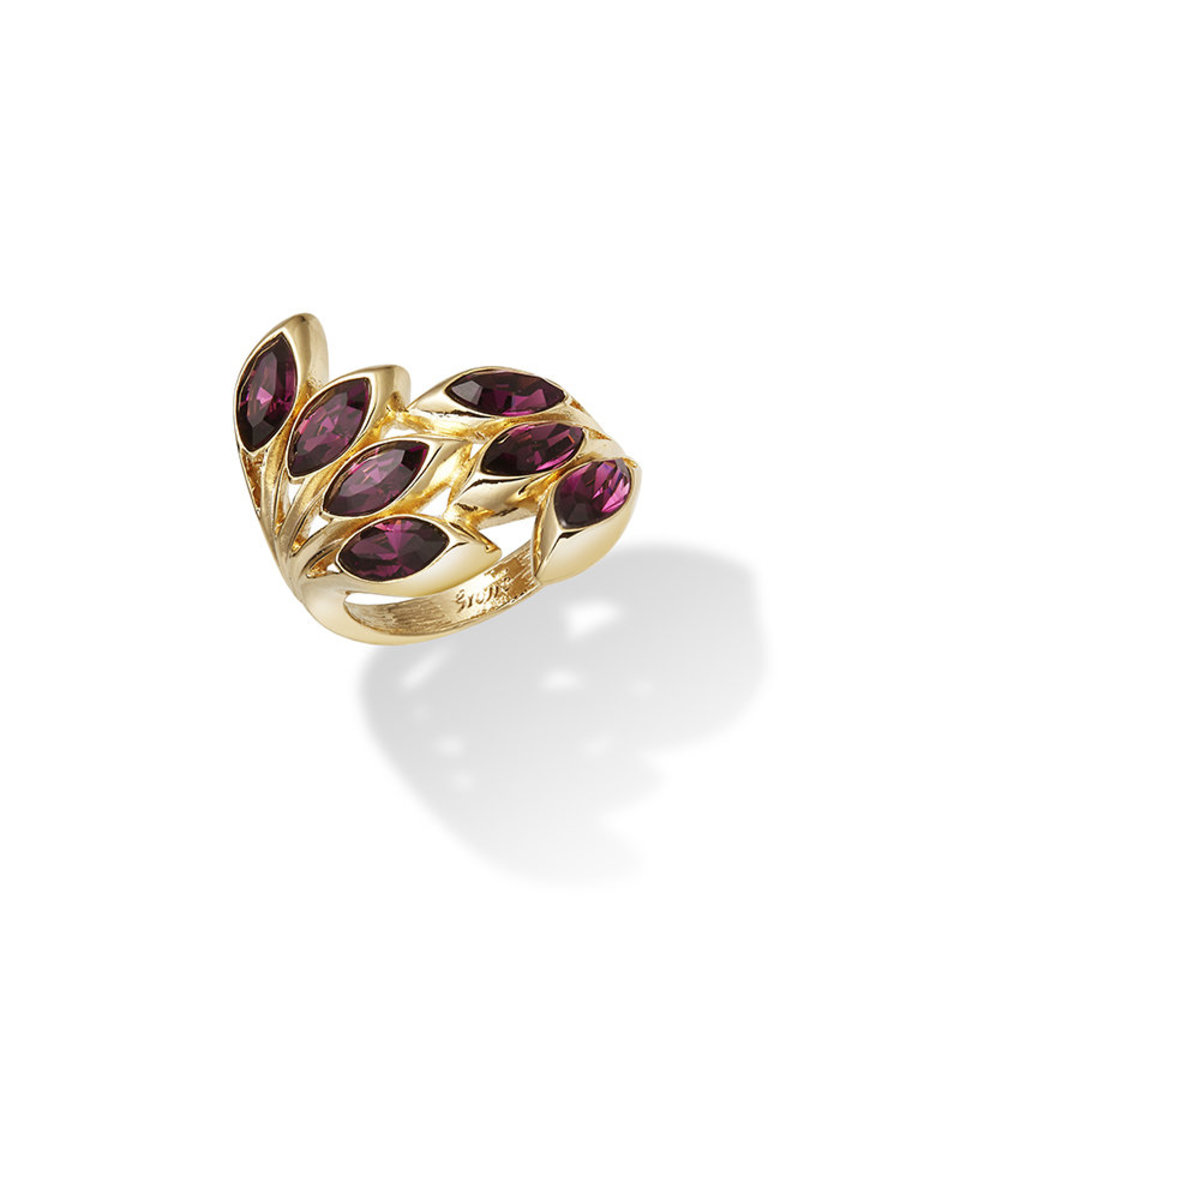 Ailes: gold plating, Swarovski amethyst crystal ring